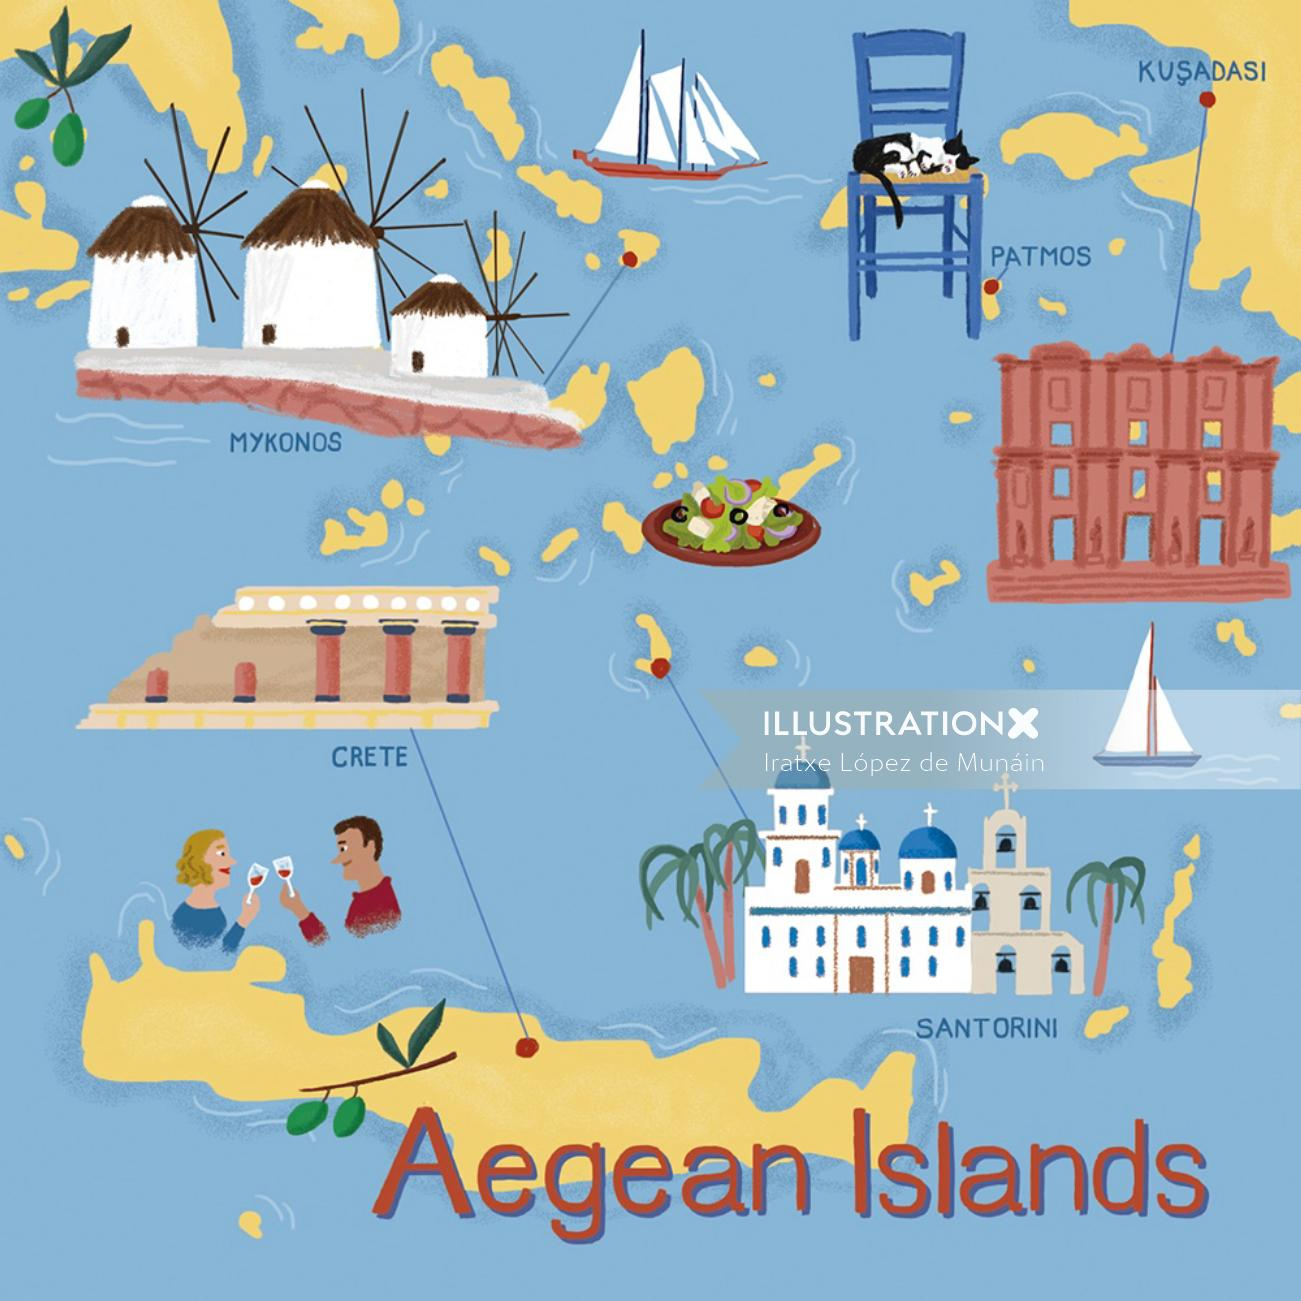 Aegean Islands map illustration